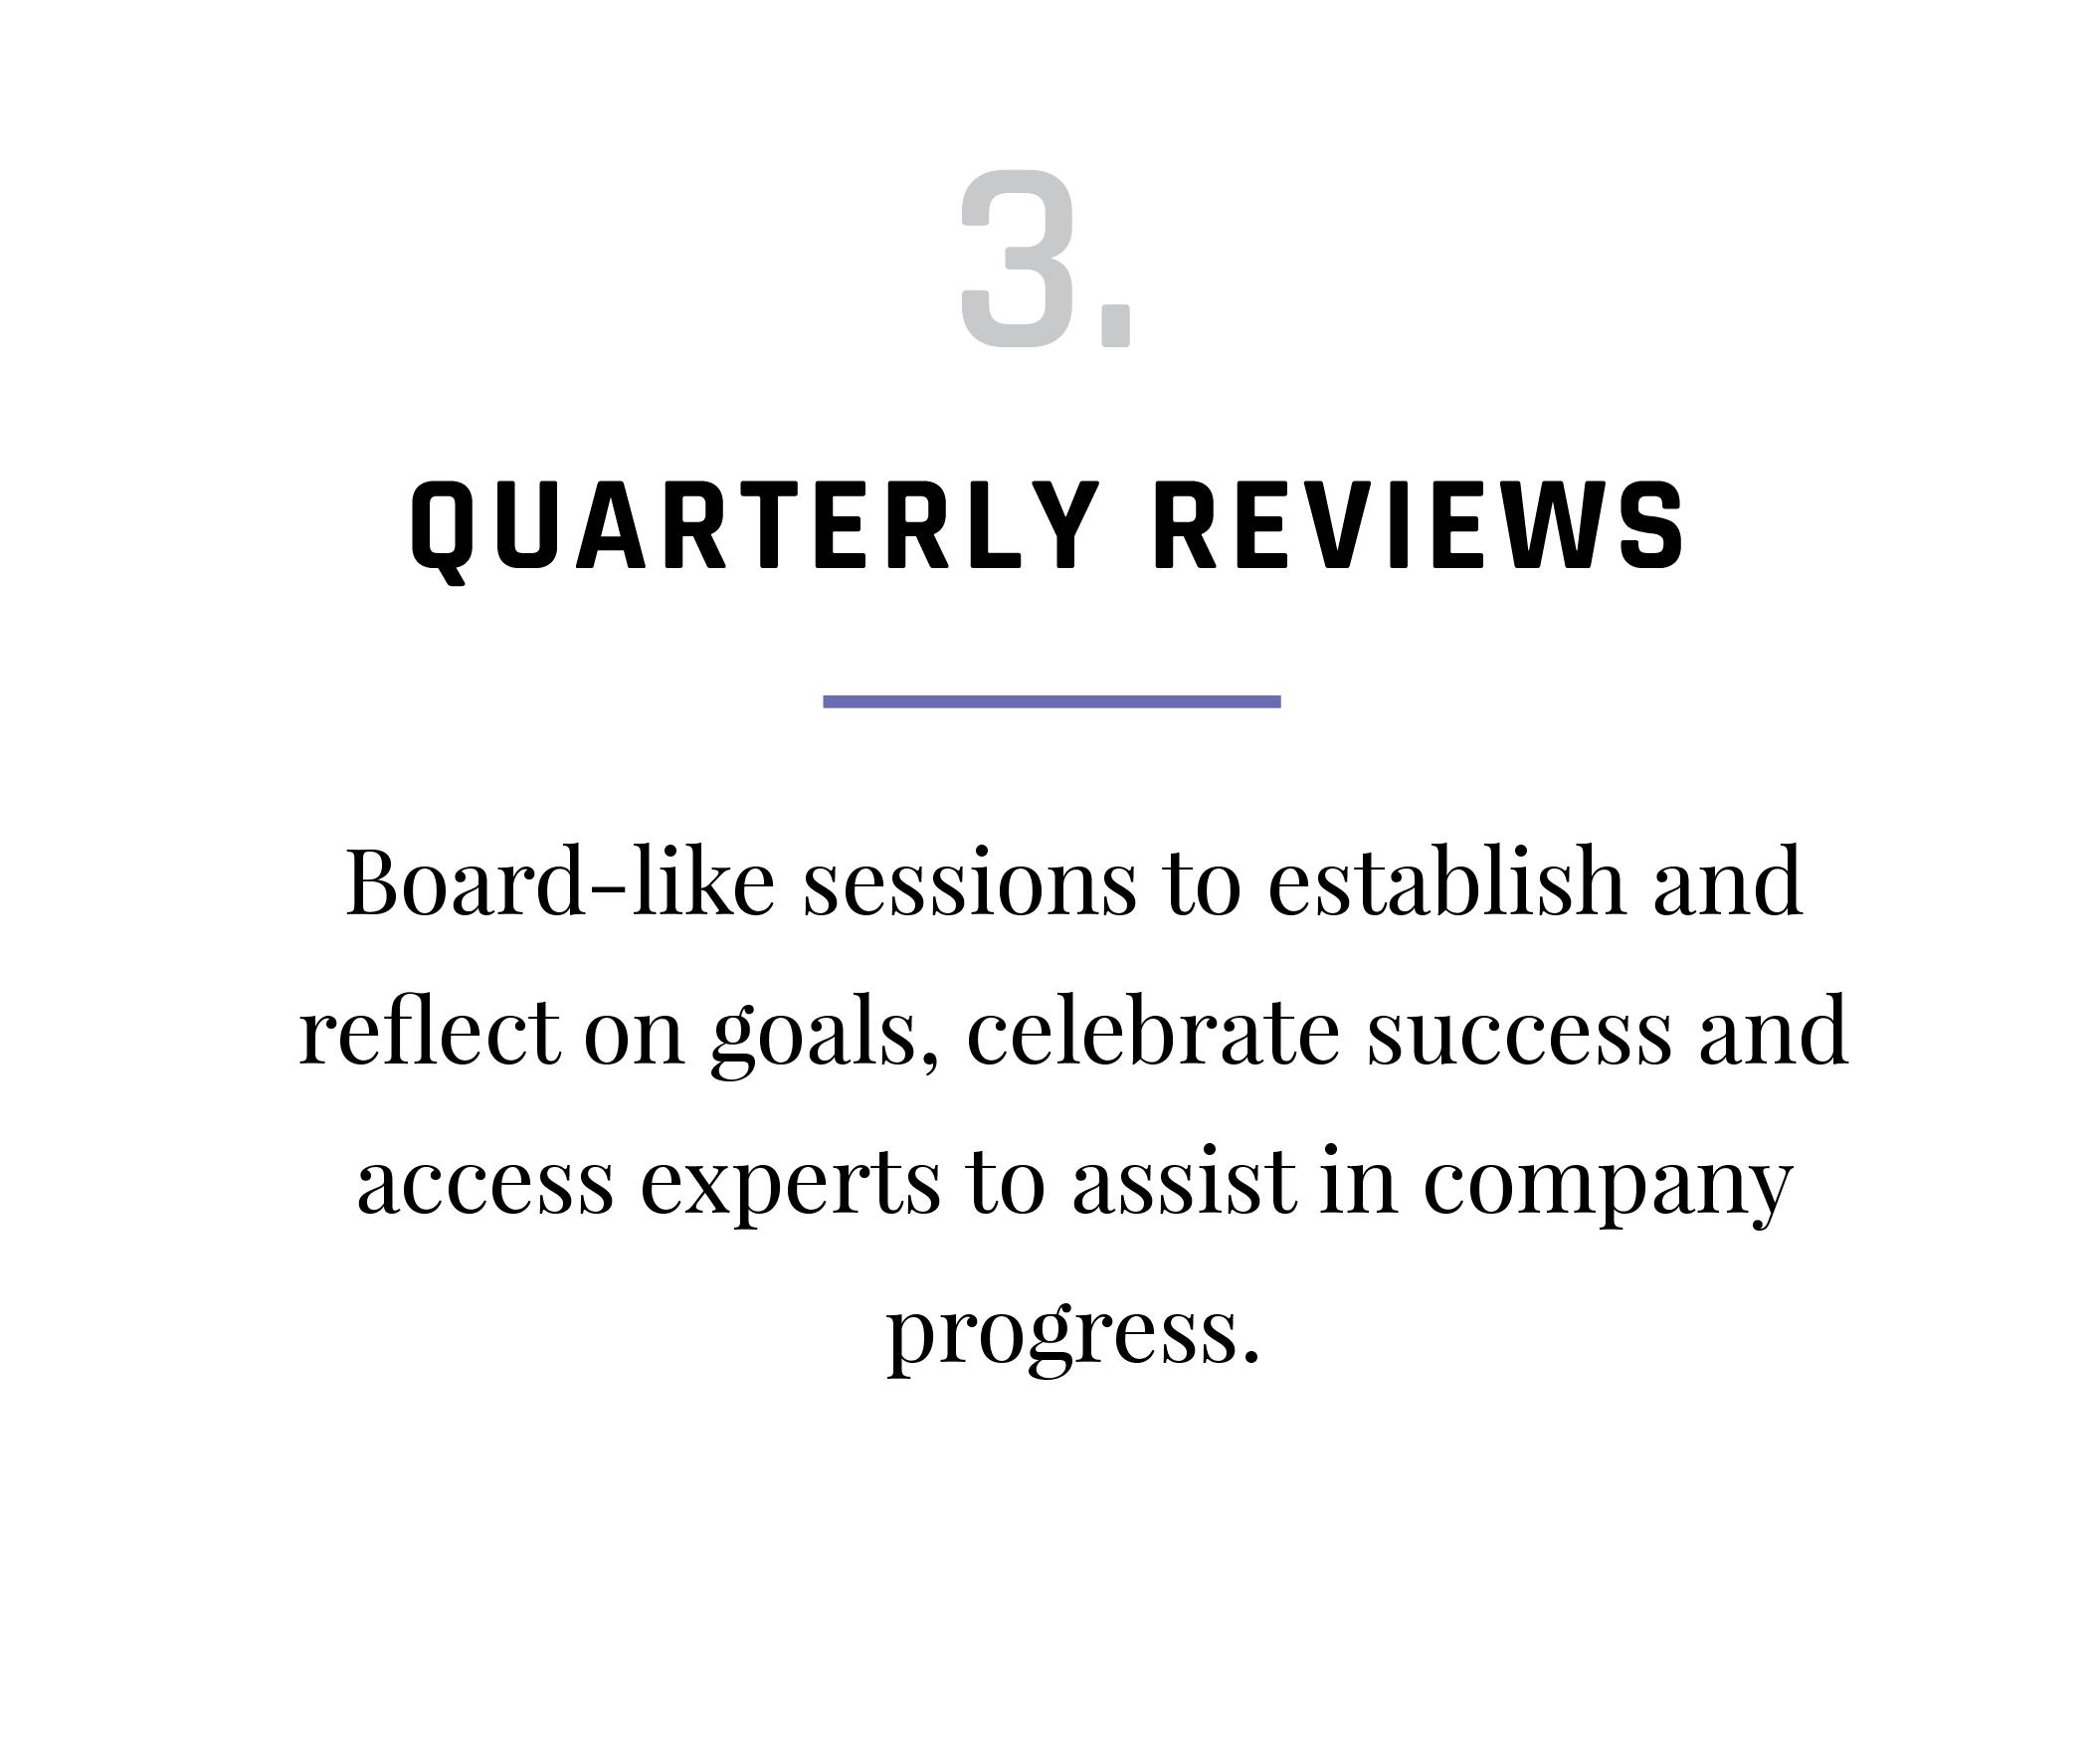 VAP-Program-Activities_Quarterly Reviews.png